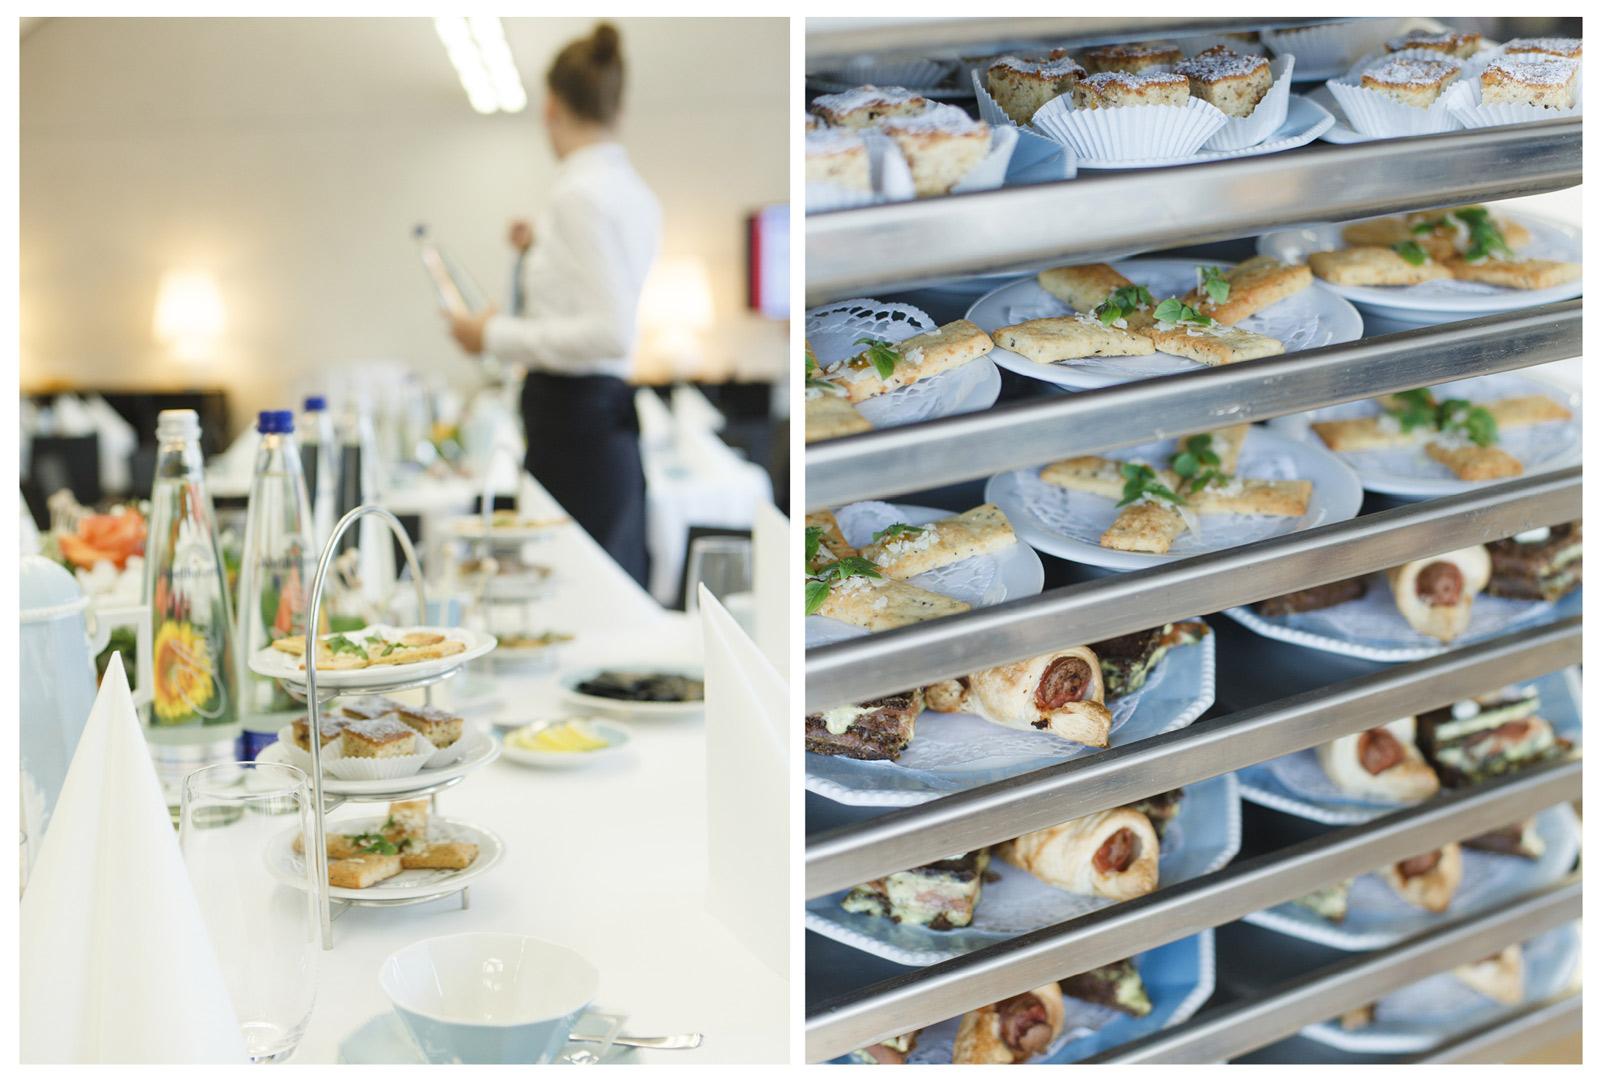 Hotelfotografie, Catering, Event München